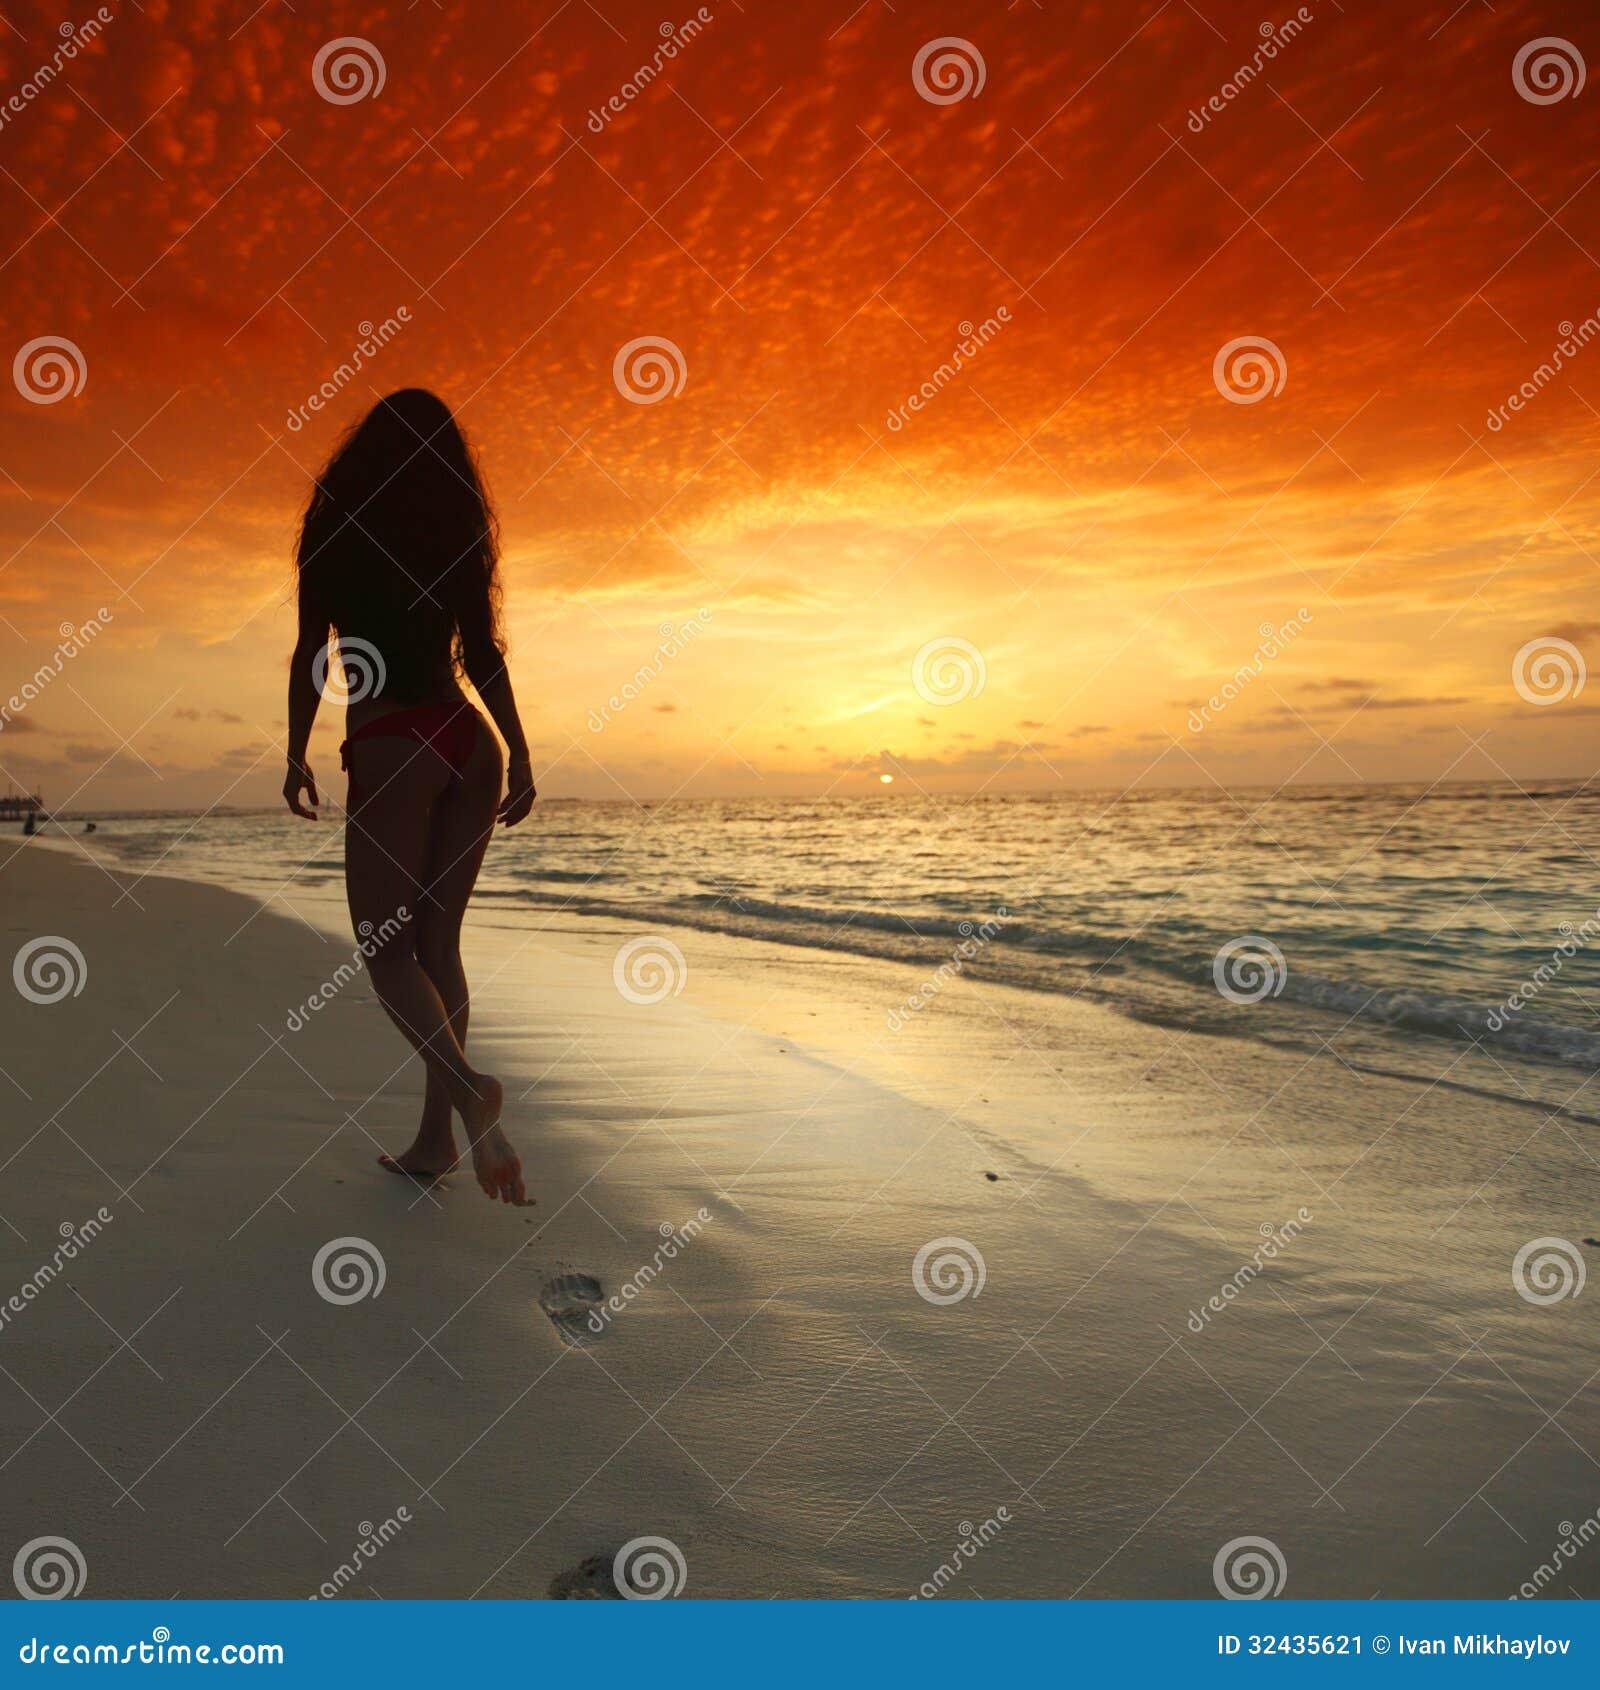 Beautiful Woman Face Over Beach Sunset Stock Image: Woman Walking On Beach Stock Image. Image Of People, Back